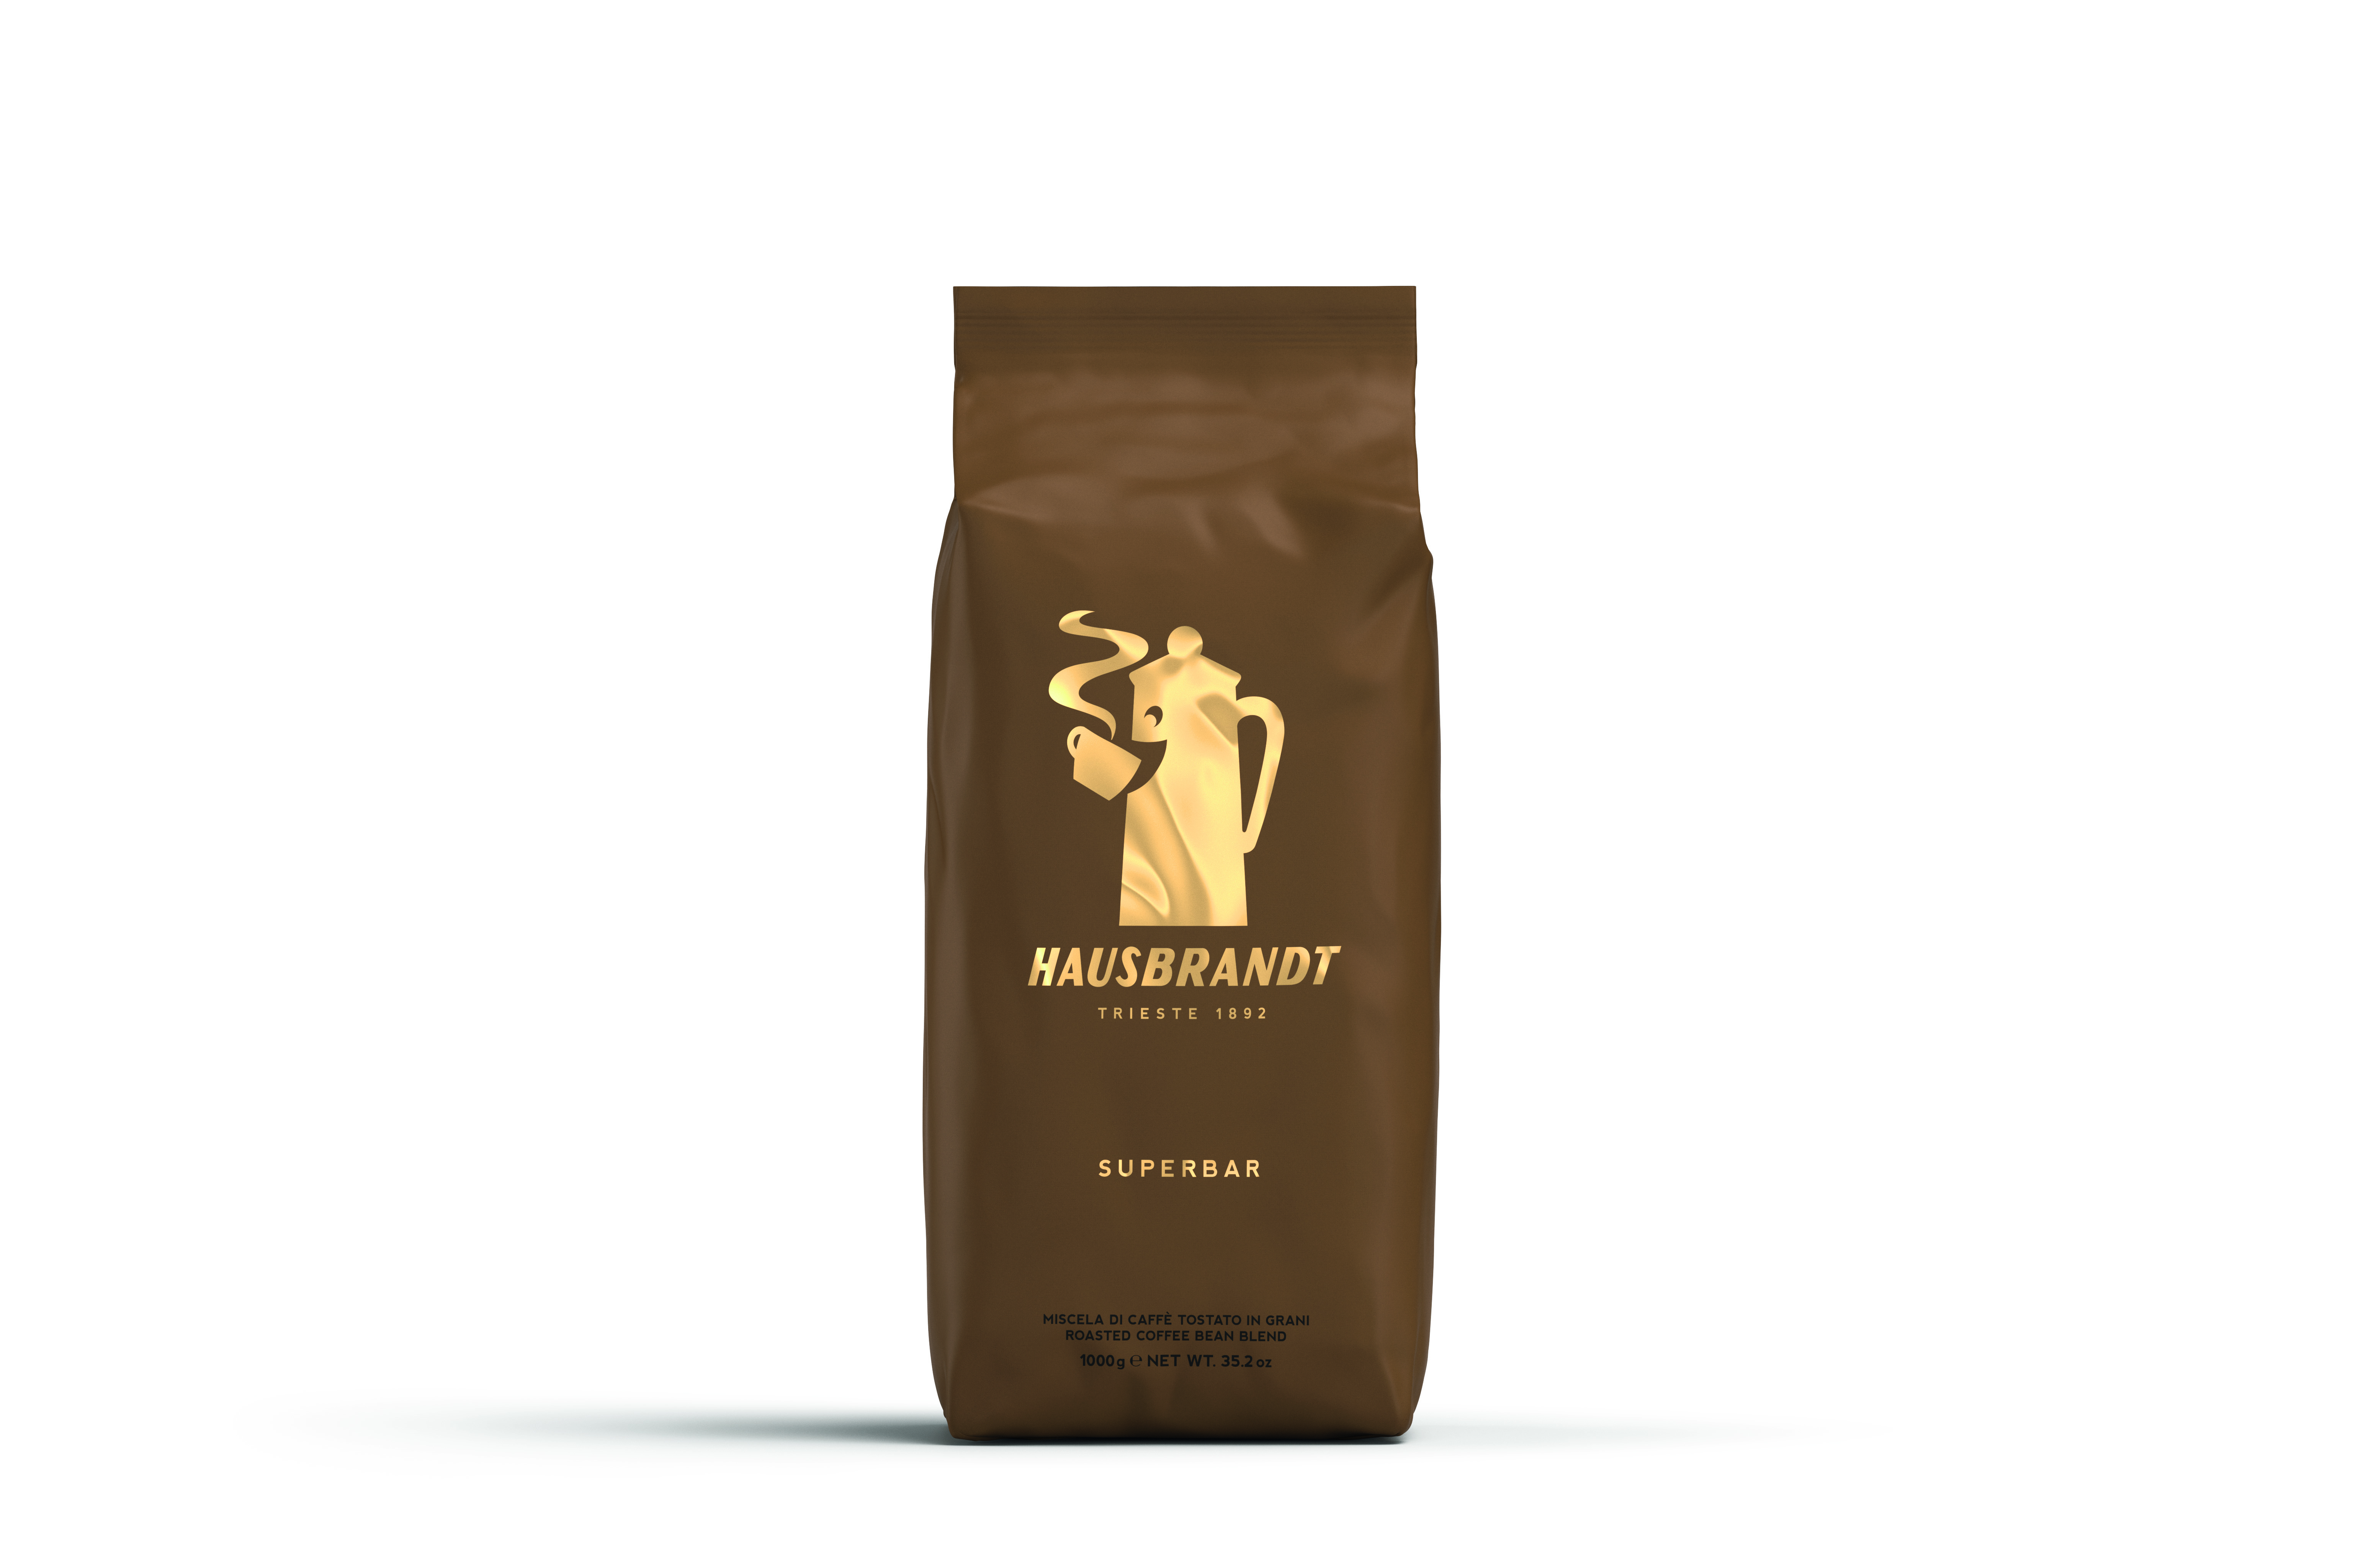 HAUSBRANDT Caffé Superbar 6 X 1 KG Bohnen im Beutel